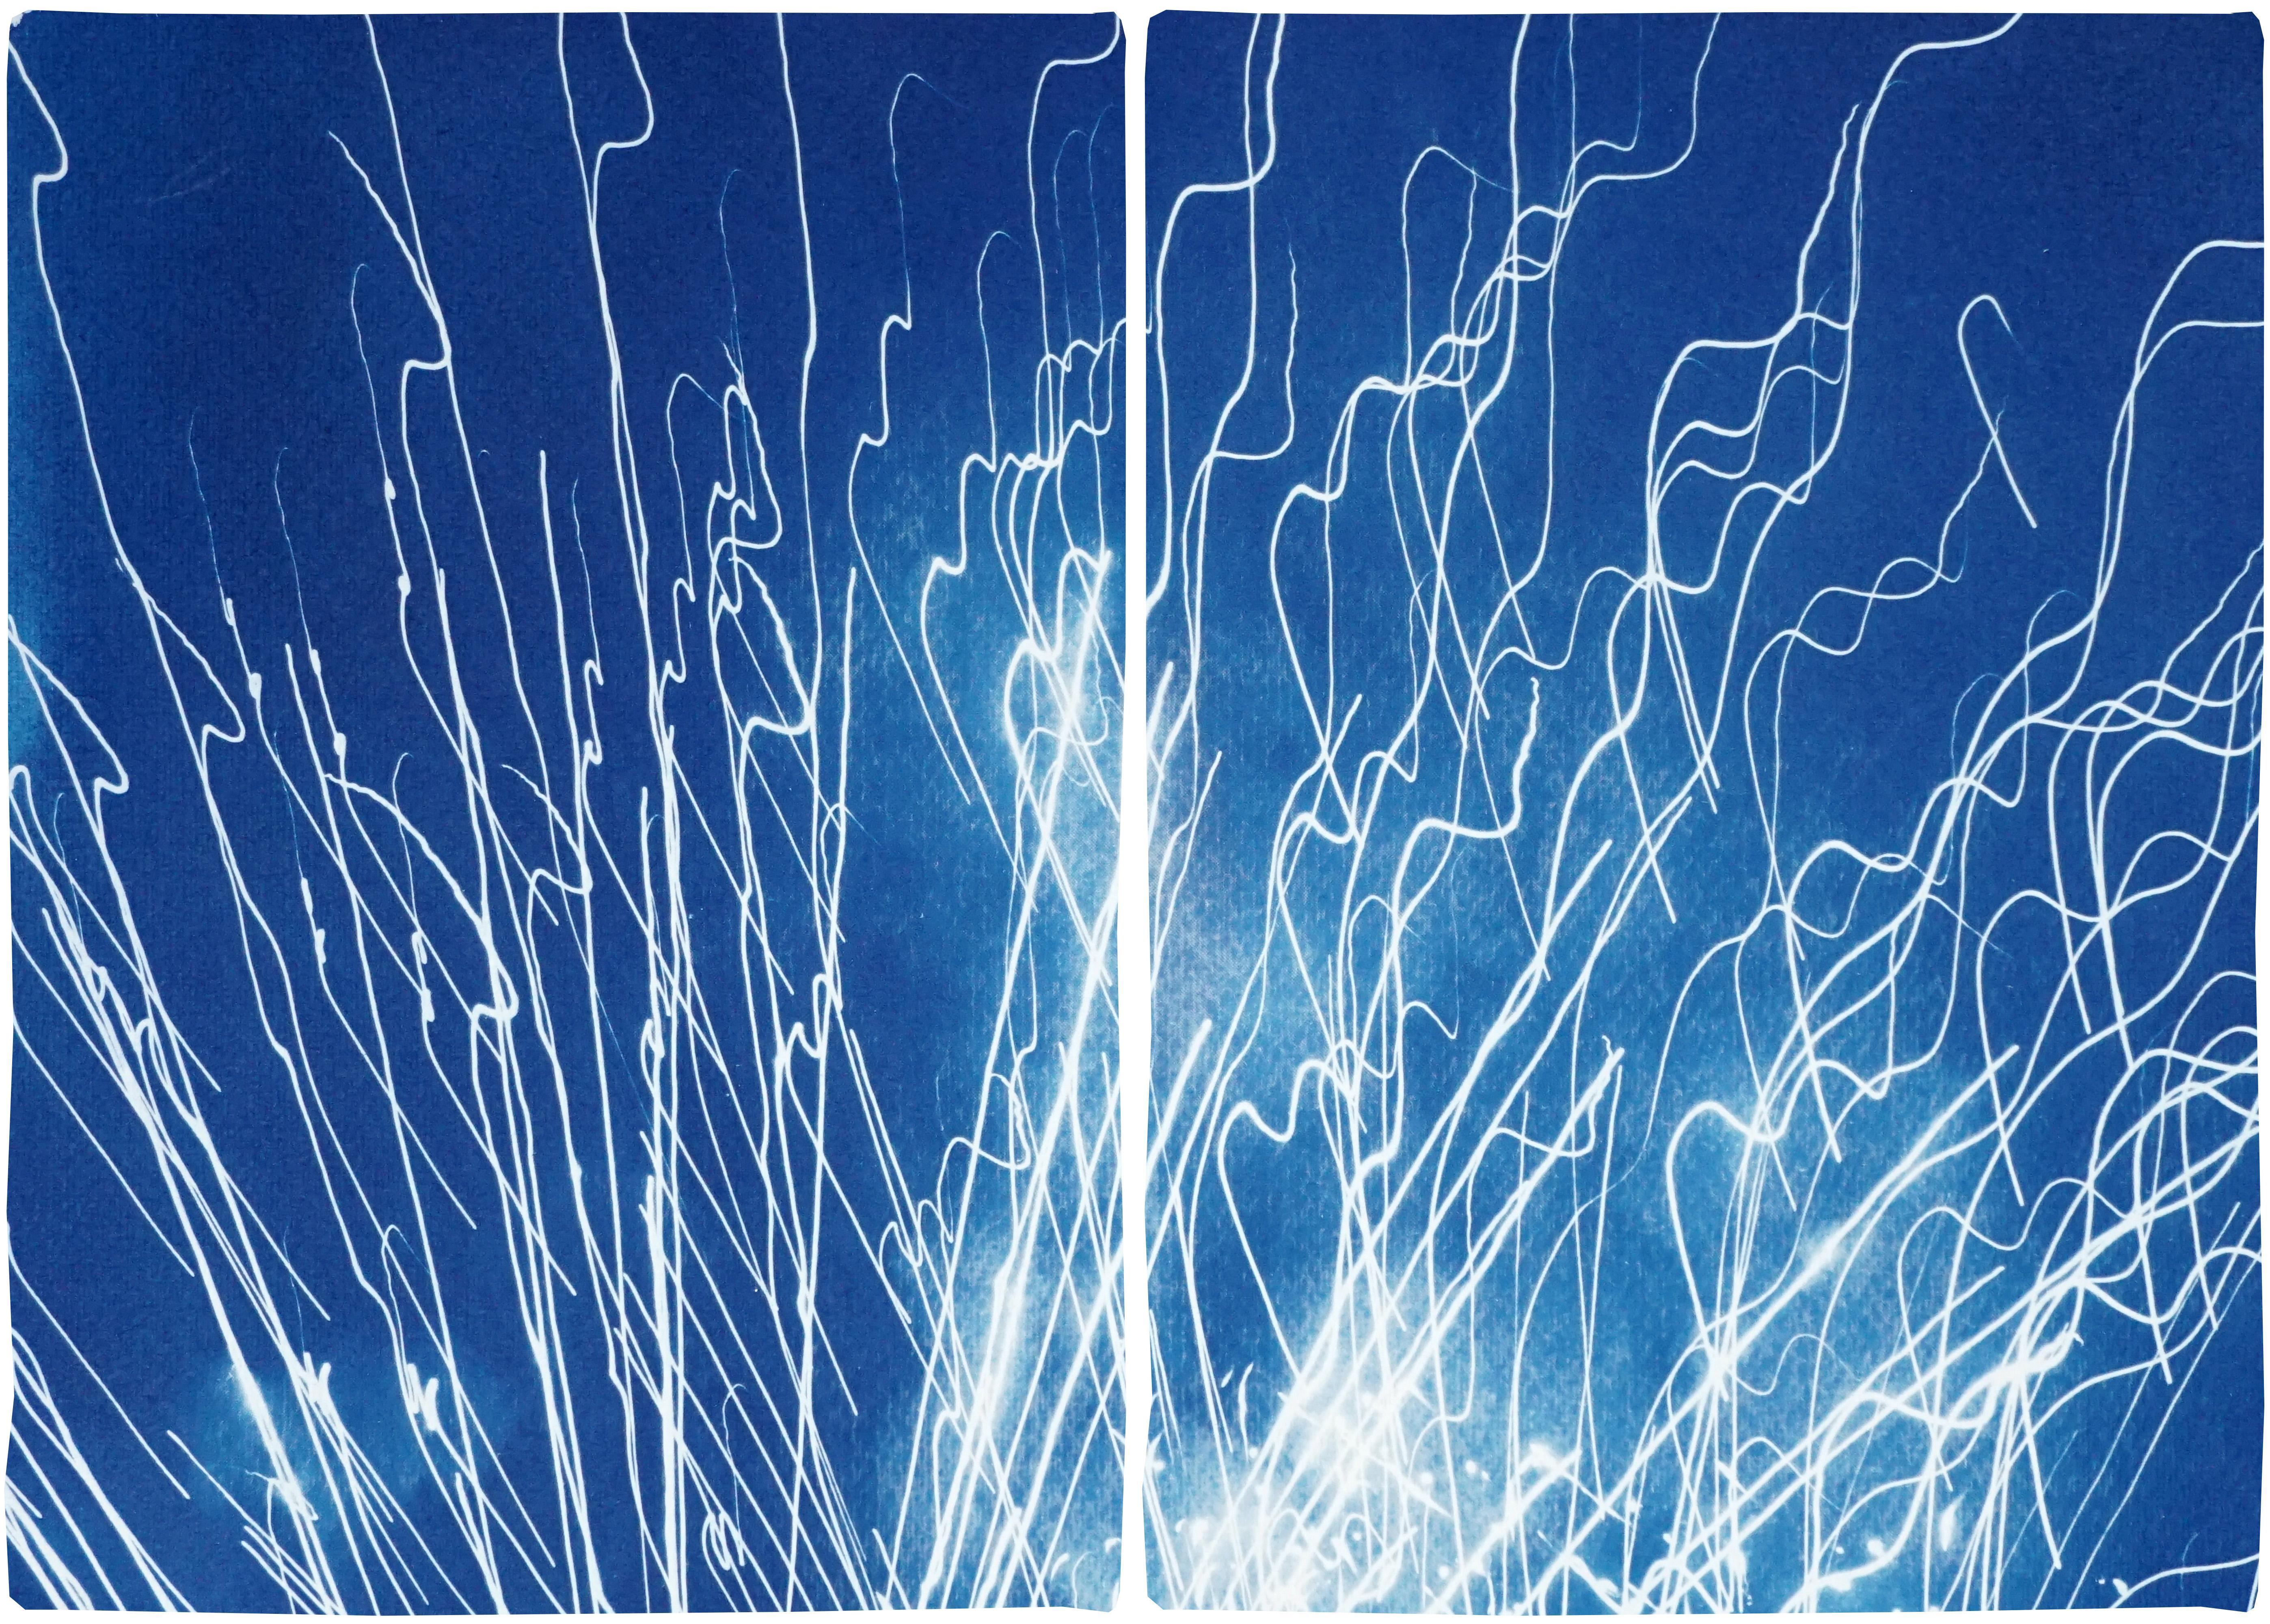 Fireworks Lights in Sky Blue Diptych, Handmade Cyanotype on Watercolor Paper,